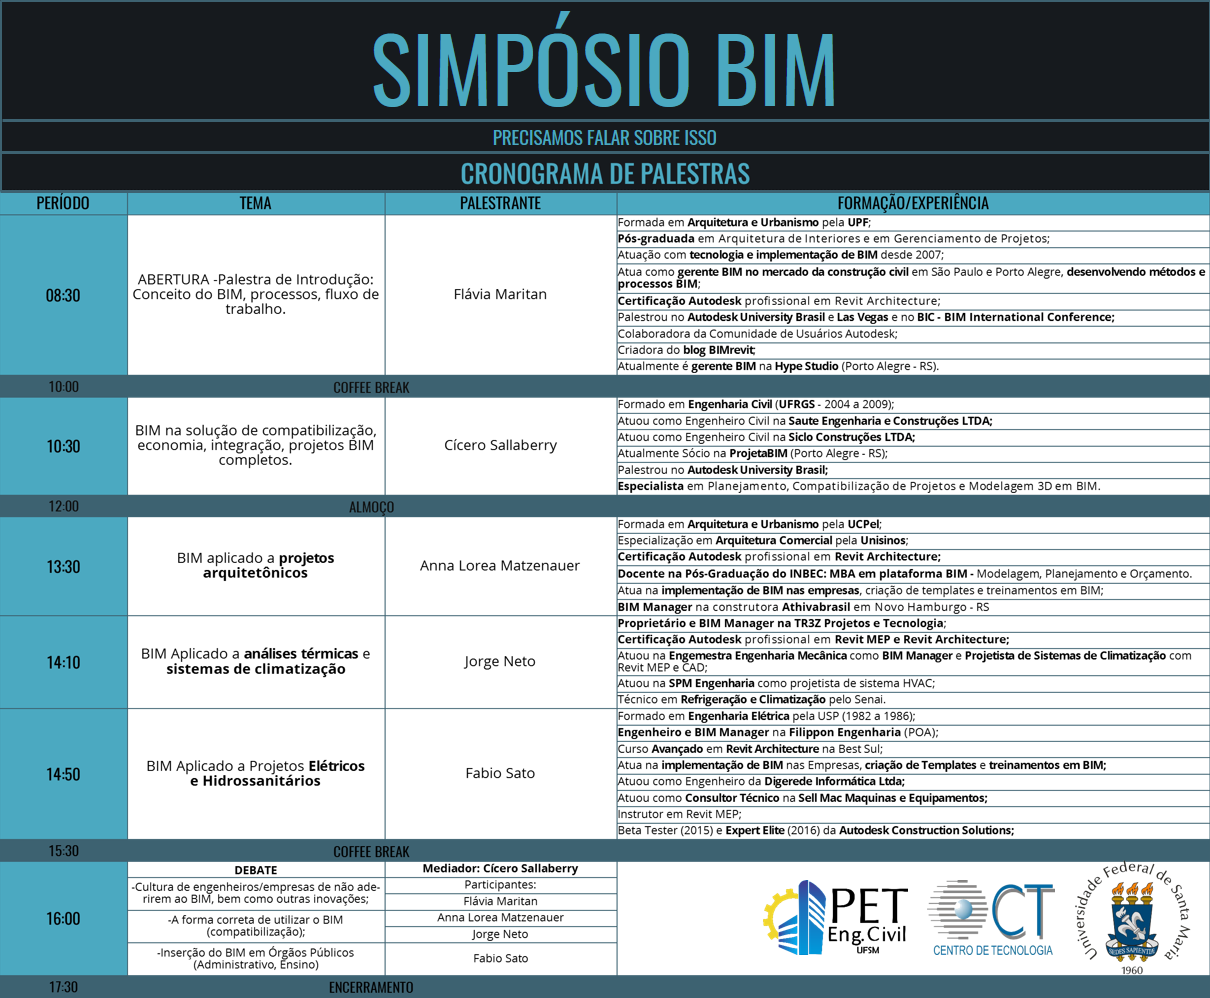 SIMPOSIO BIM PET CRONOGRAMA